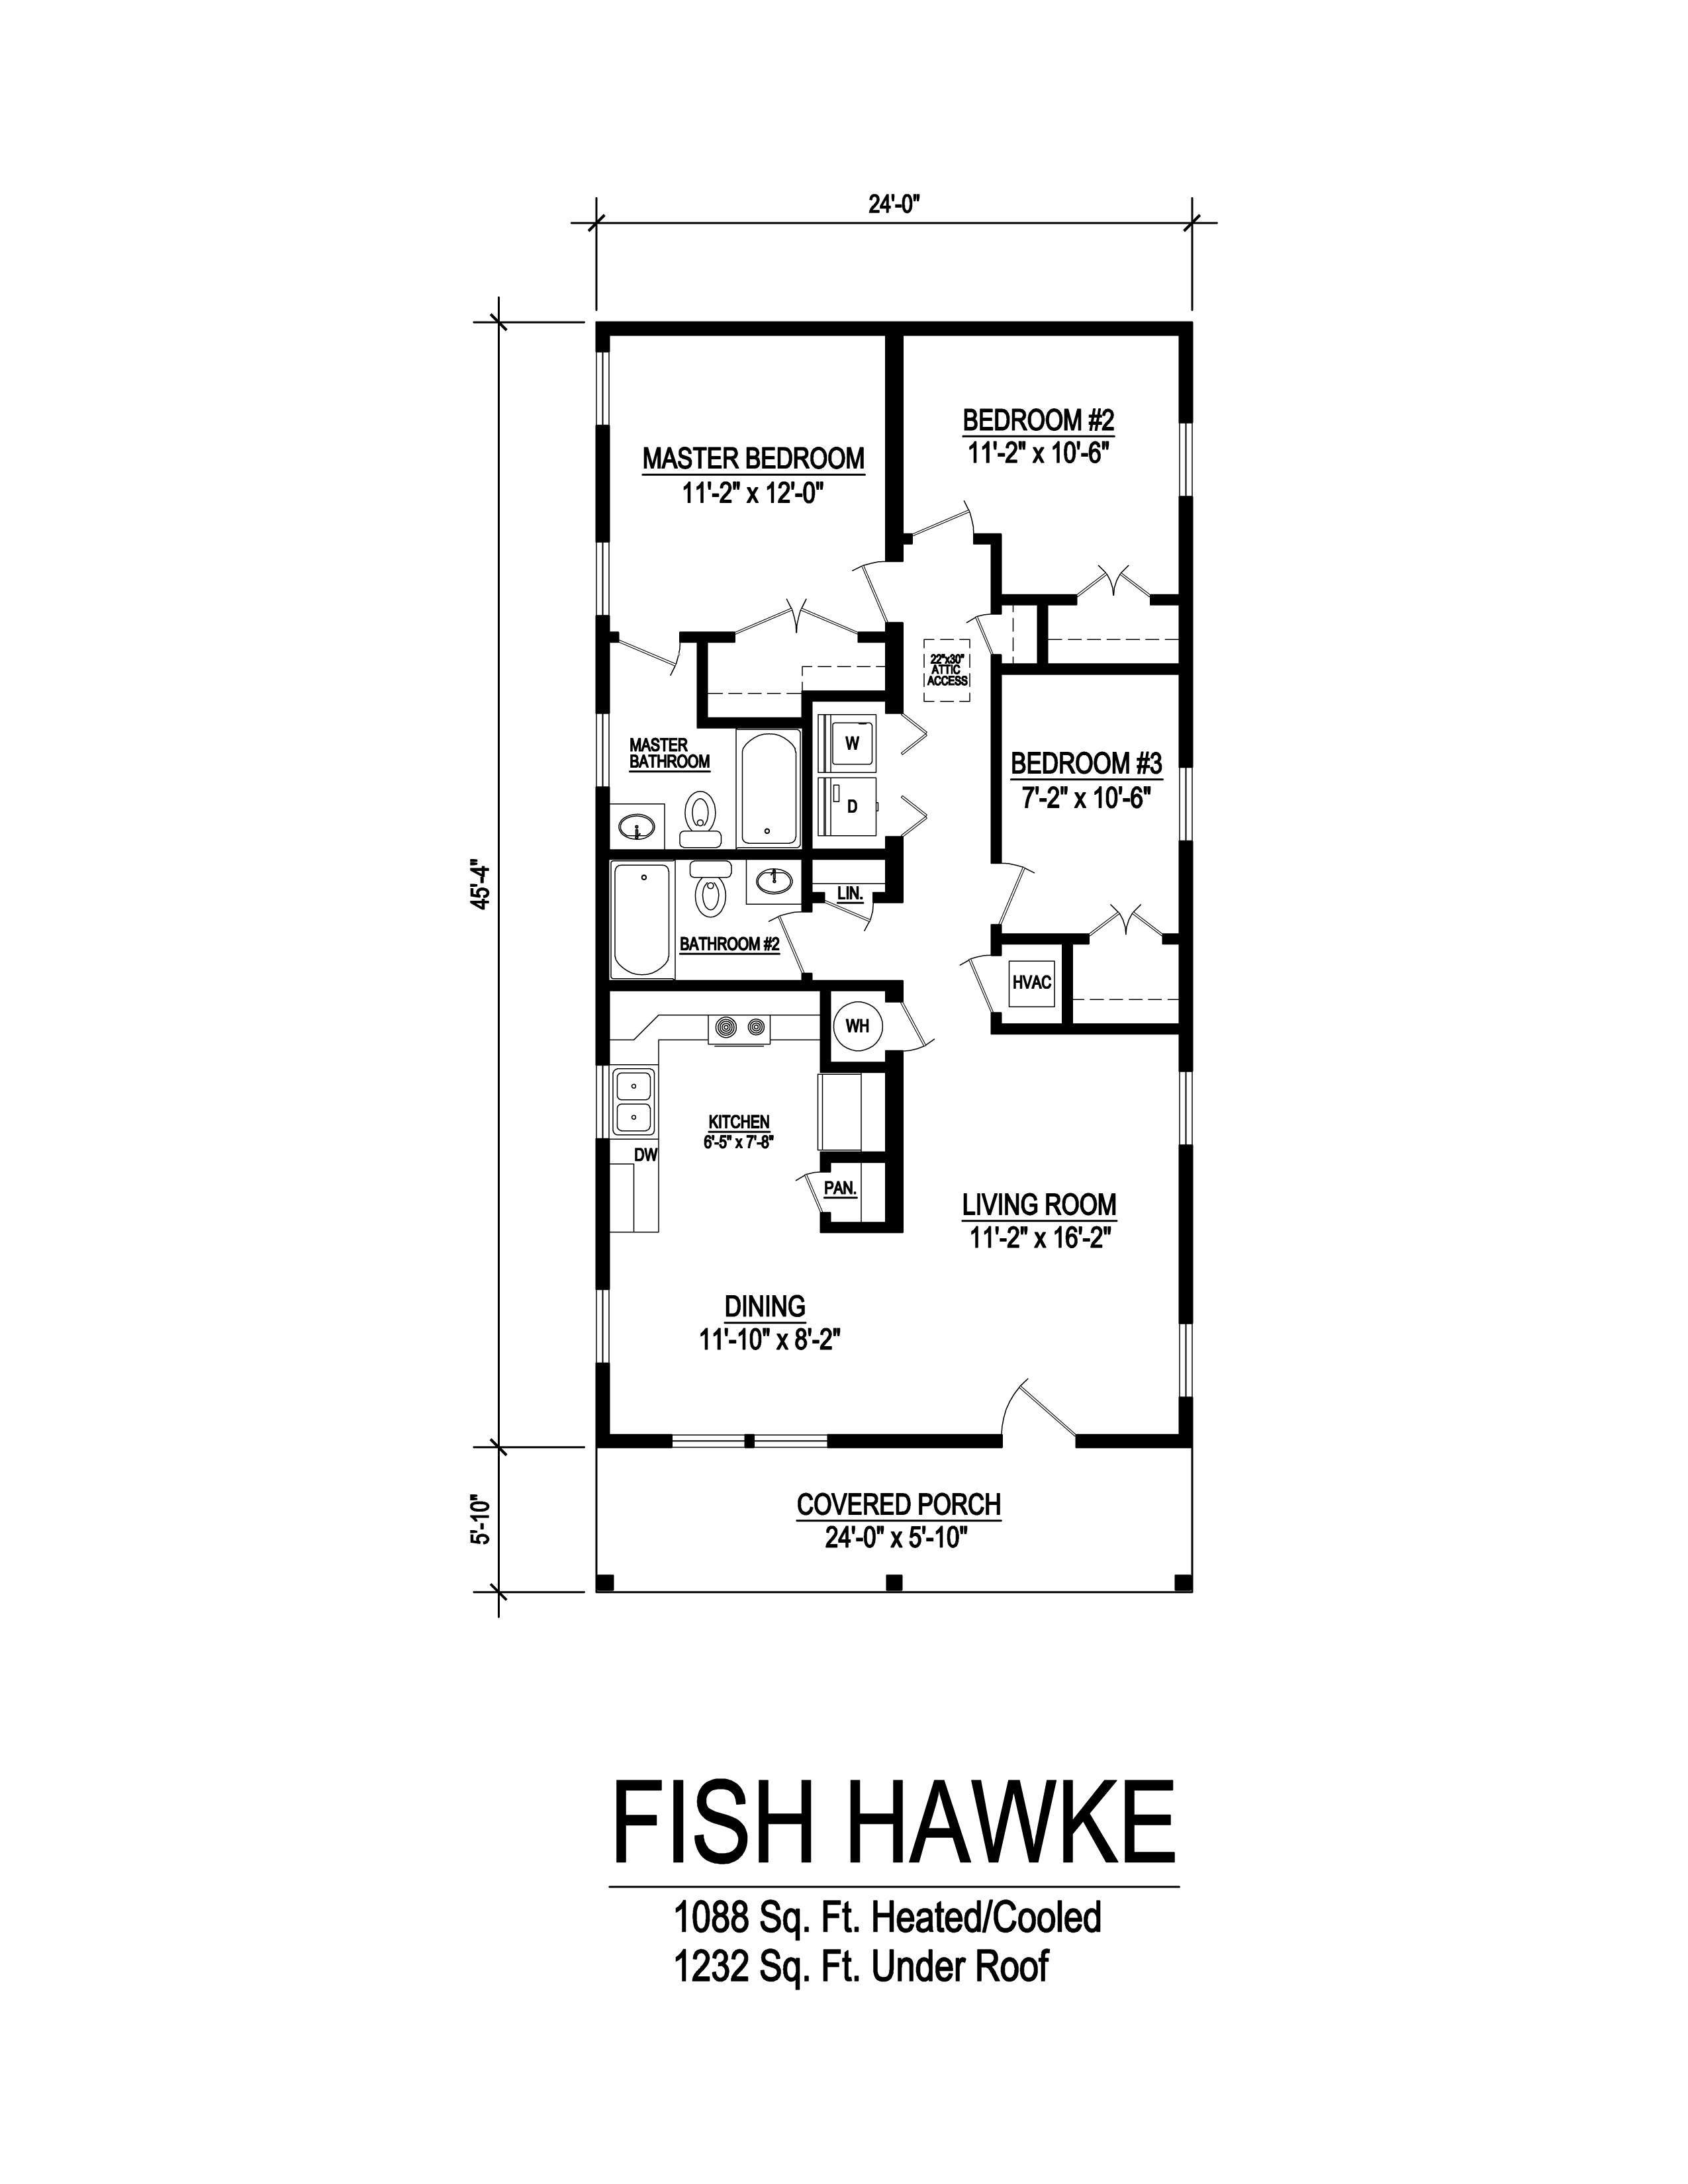 fish hawke modular home floorplan